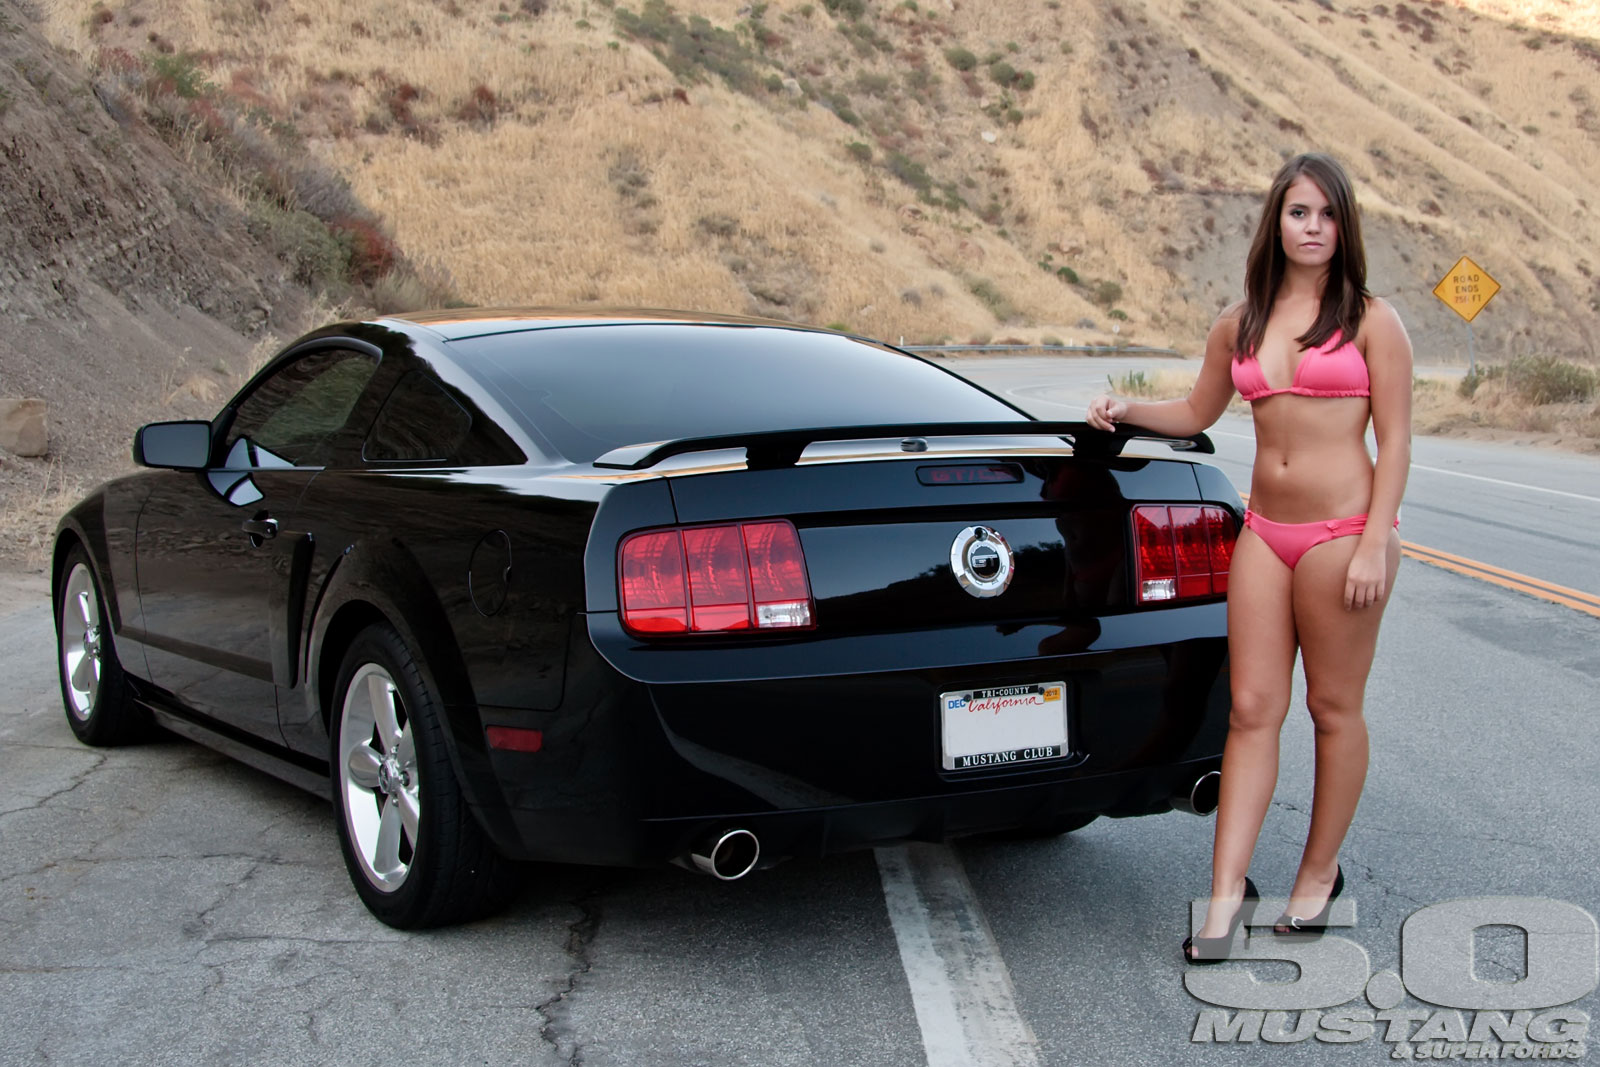 Car Wallpaper Slideshow 678 Ford Mustang Hd Wallpapers Backgrounds Wallpaper